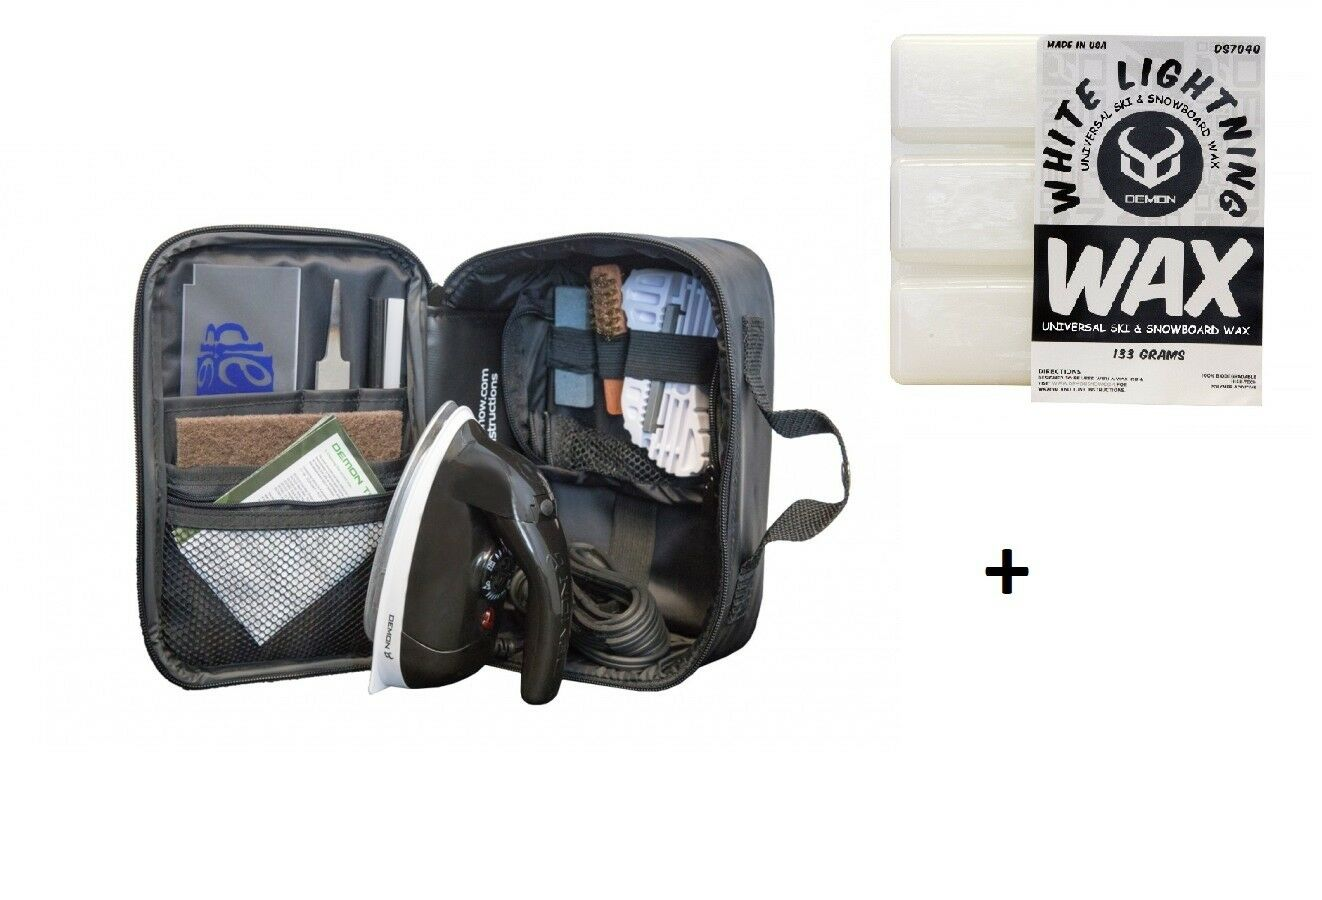 Maintenance Kit Ski Snowboard Foils Ski Wax Demon Complete Tune Kit DS 7700